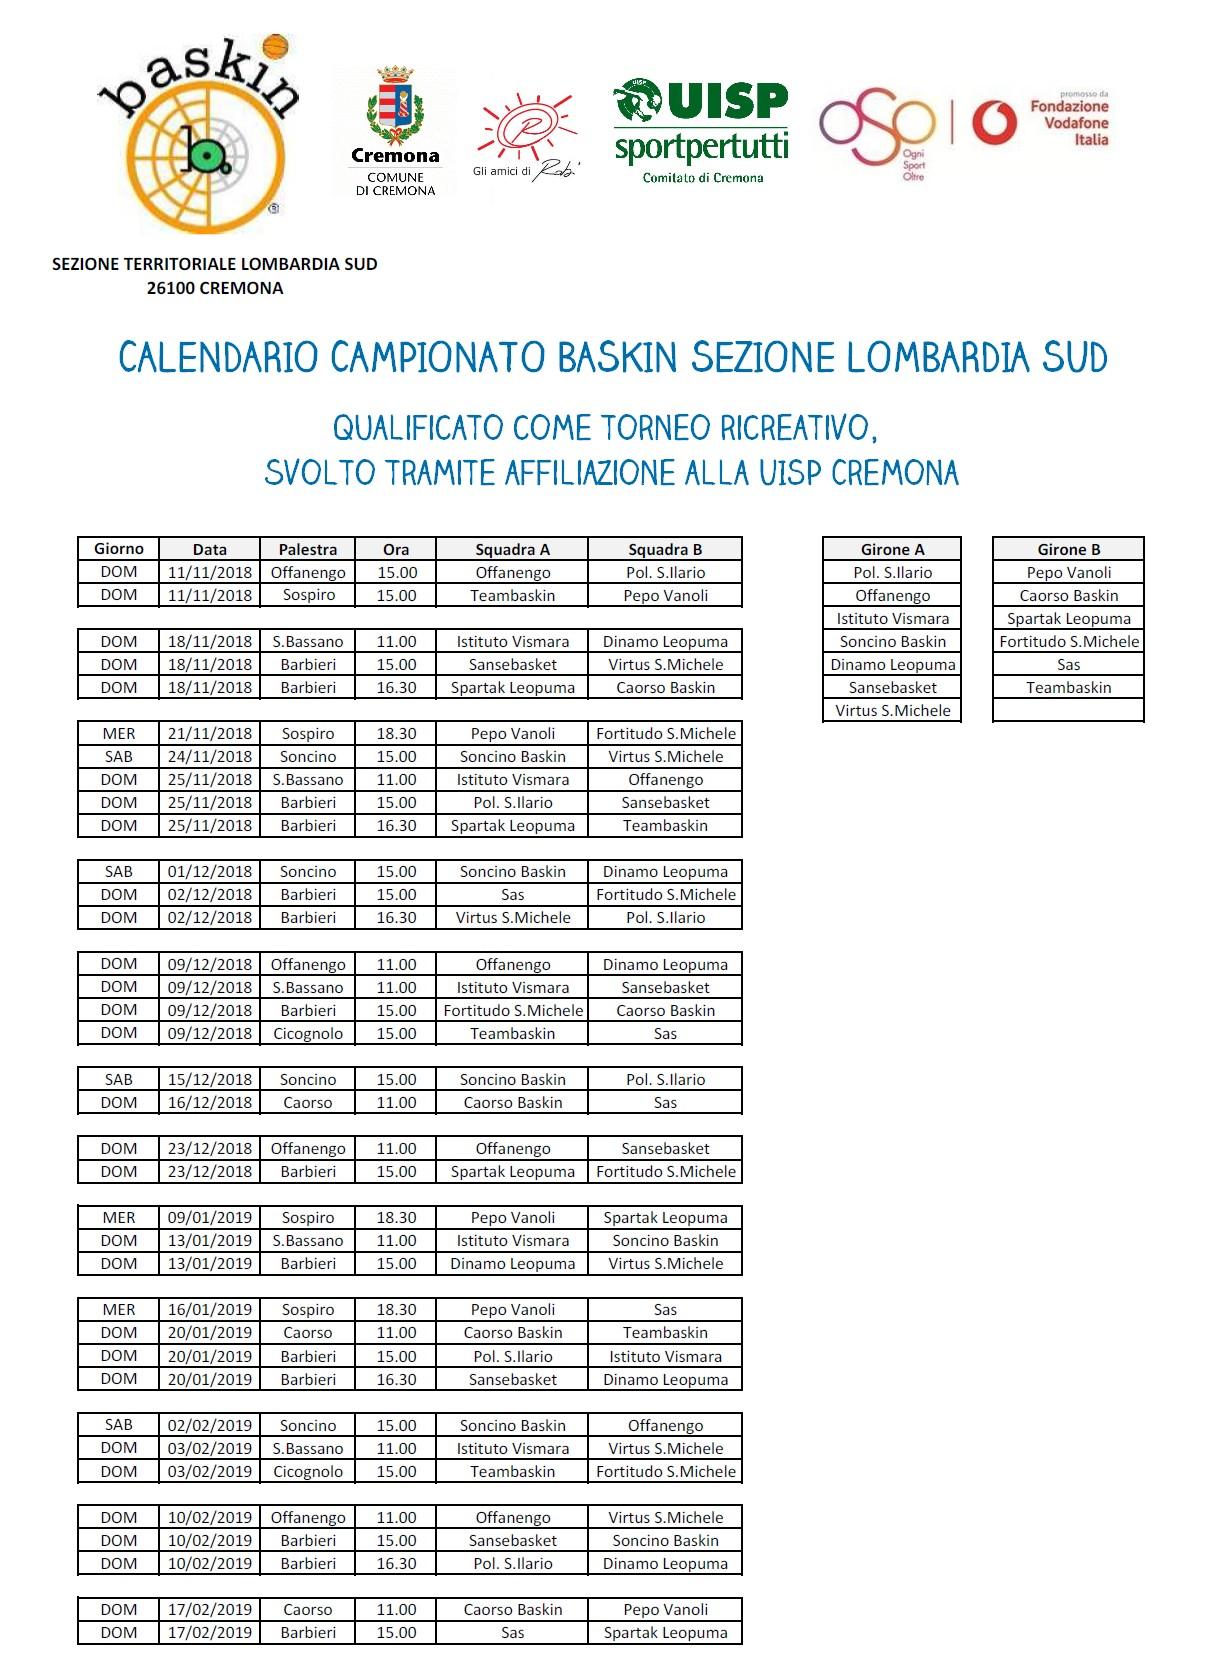 Calendario Cremonese.Il Calendario Del Campionato Cremonese Baskin